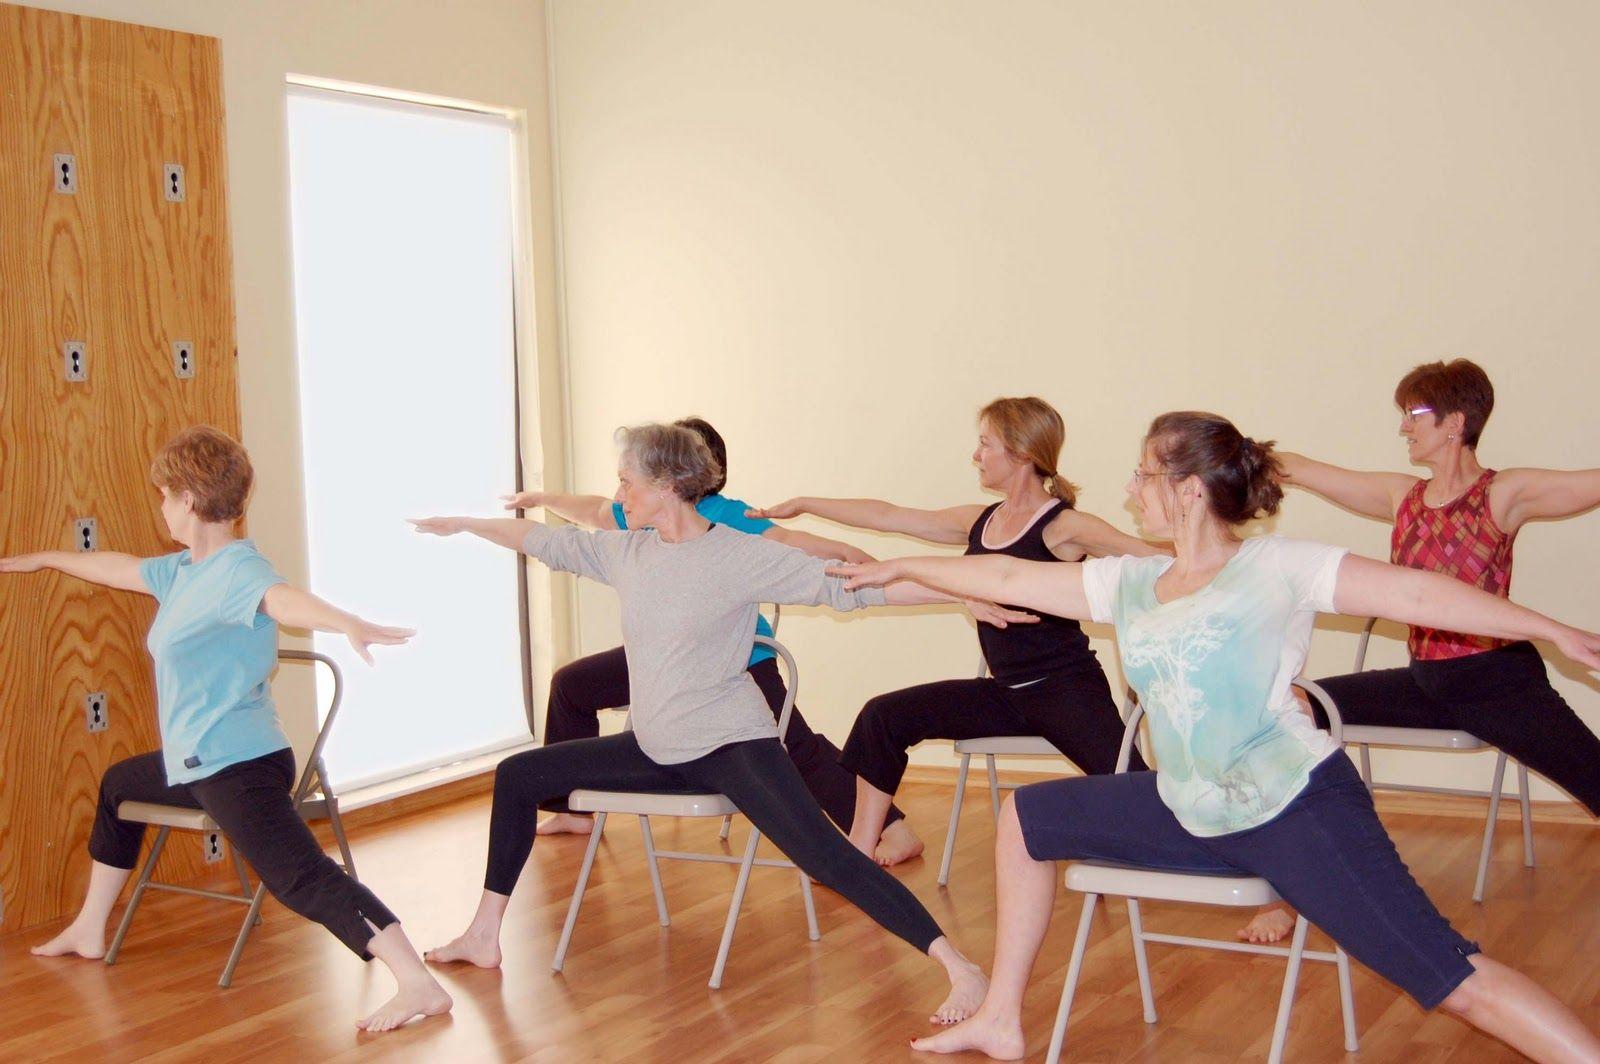 chair games for seniors flip beds free yoga 43yoga 43poses 43for 43seniors